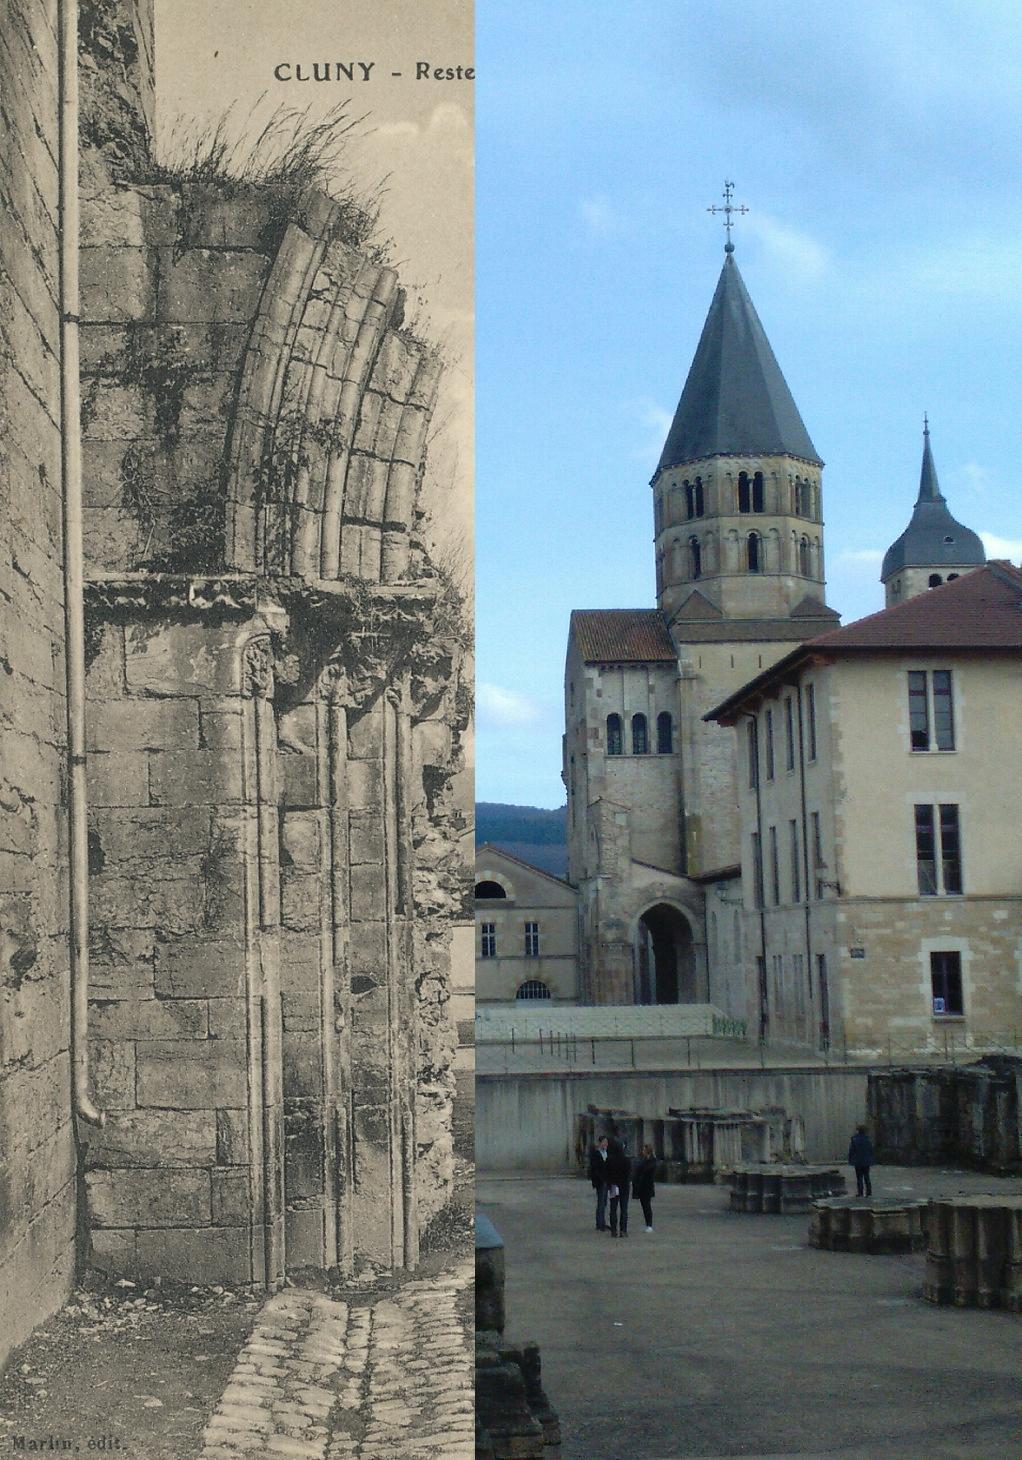 Cluny - Cluny. Restes du portail de l'ancienne abbaye.